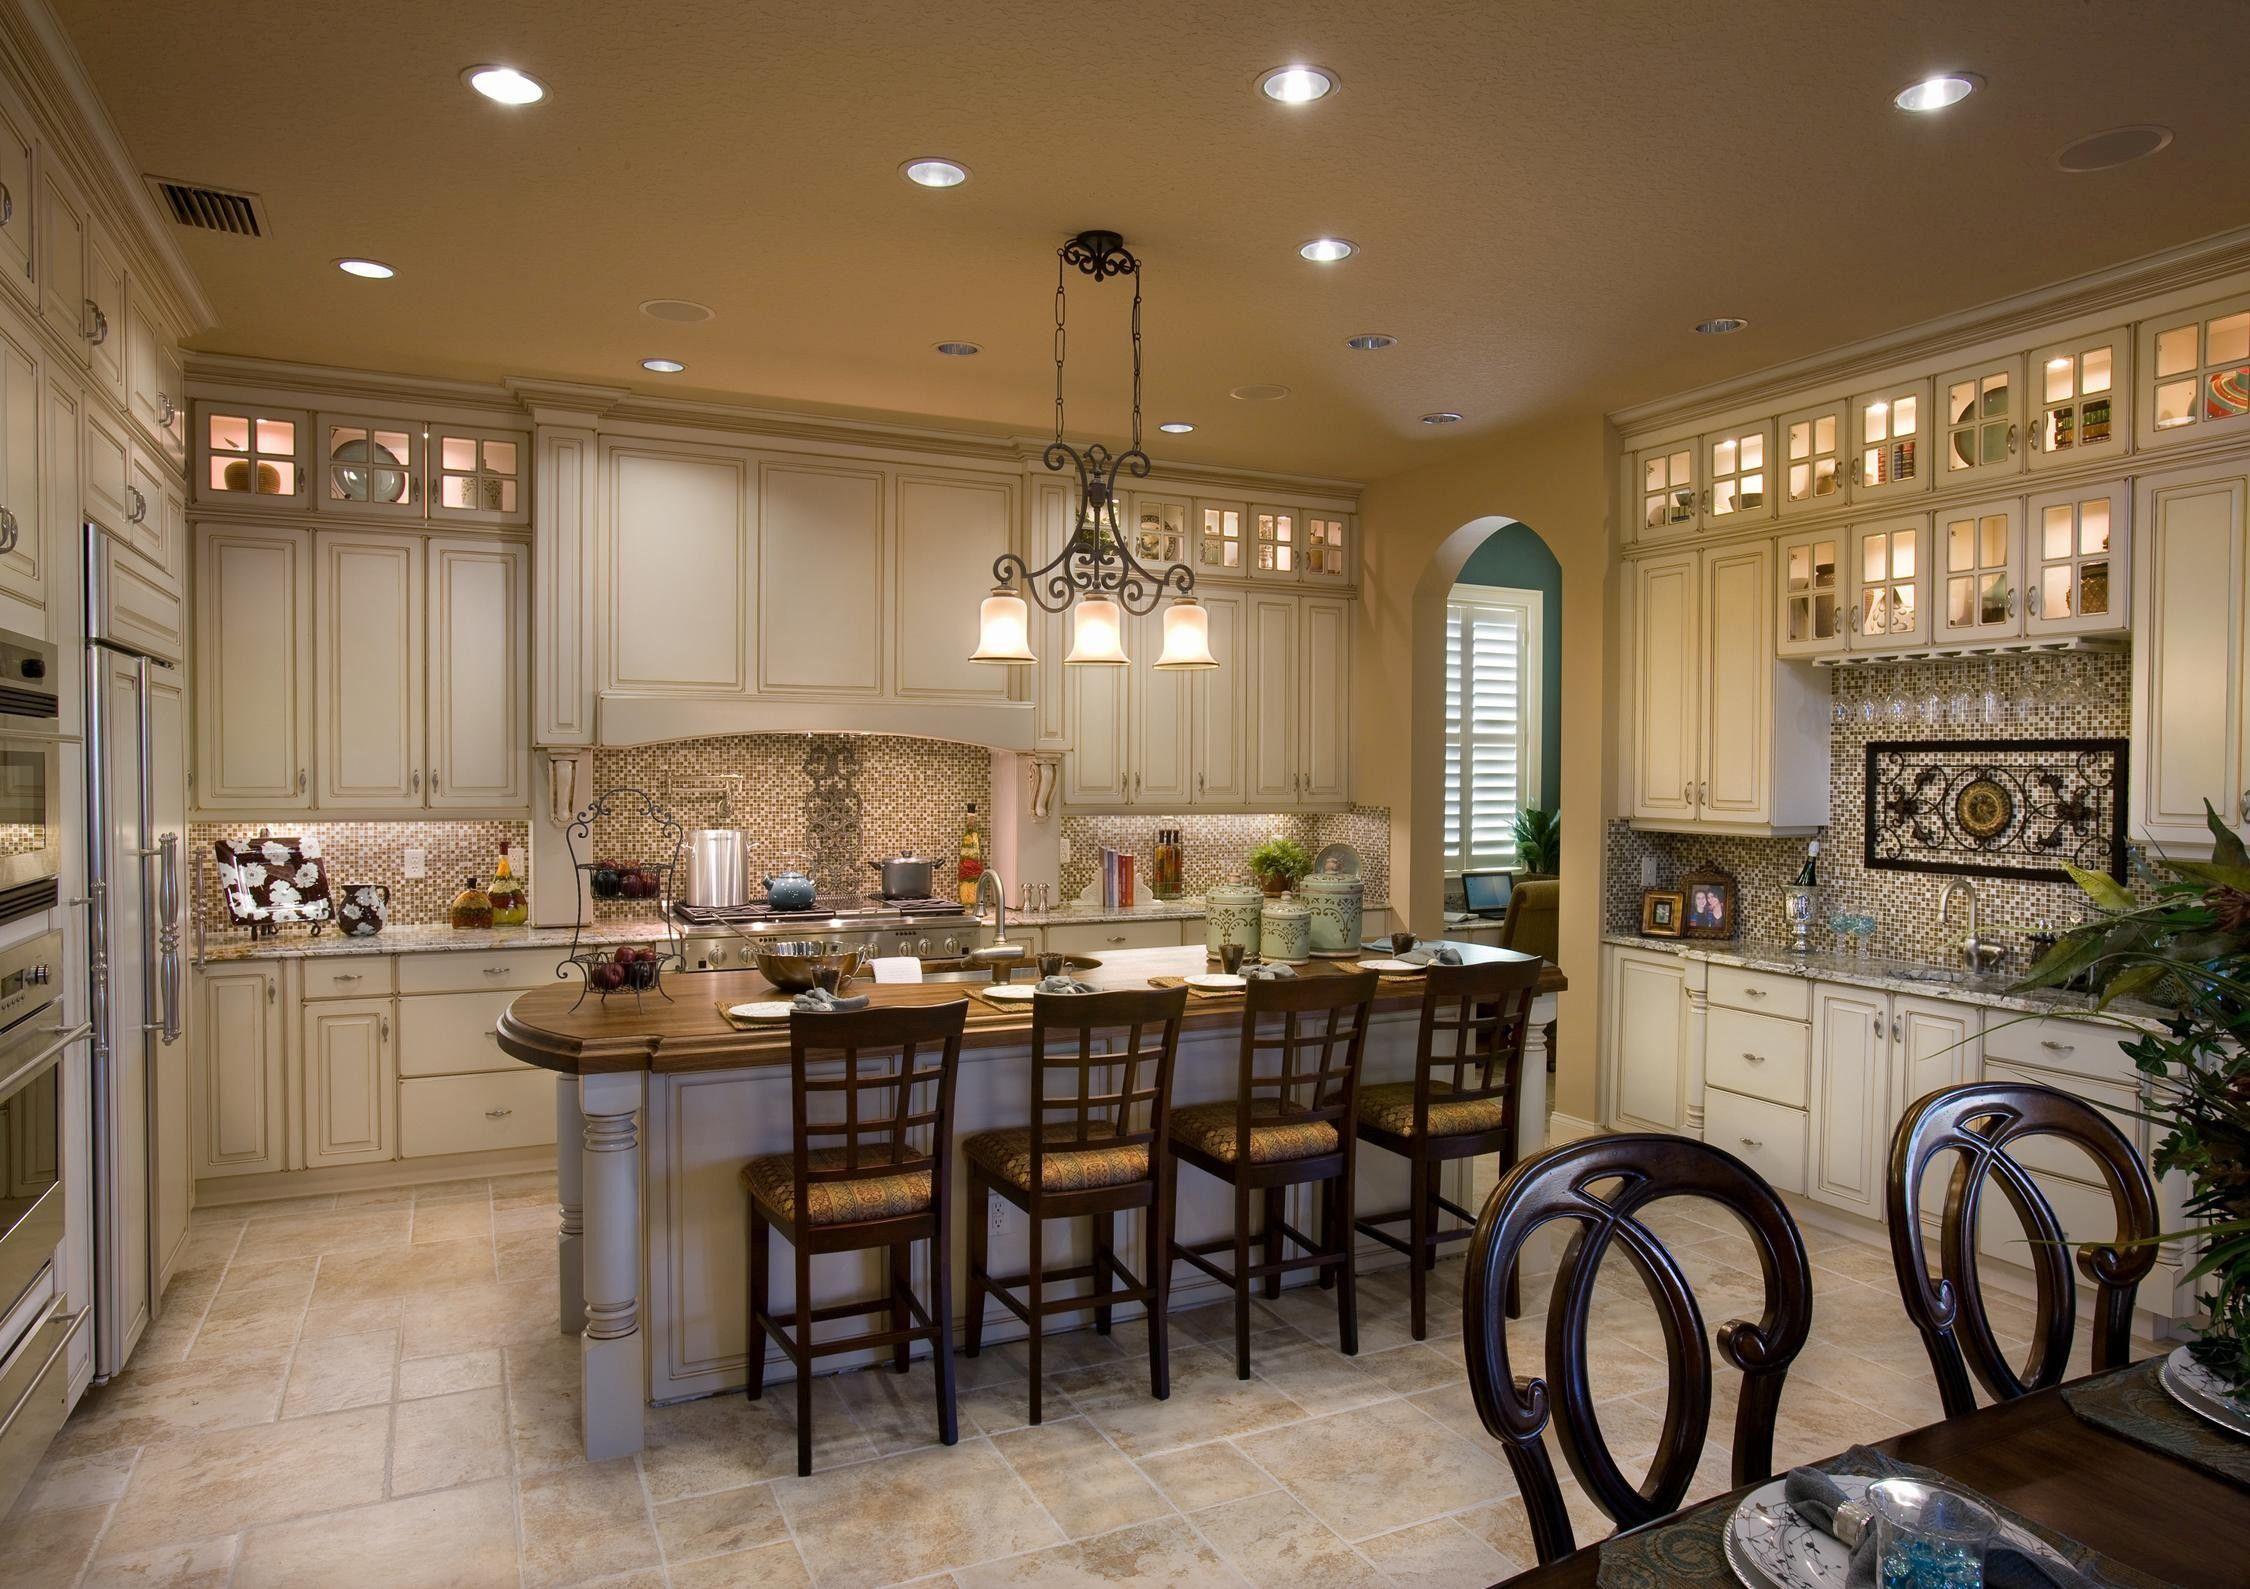 Model Homes Kitchens  Emerald Showcase Model 3 Kitchenusing Adorable Kitchen Model Design Inspiration Design